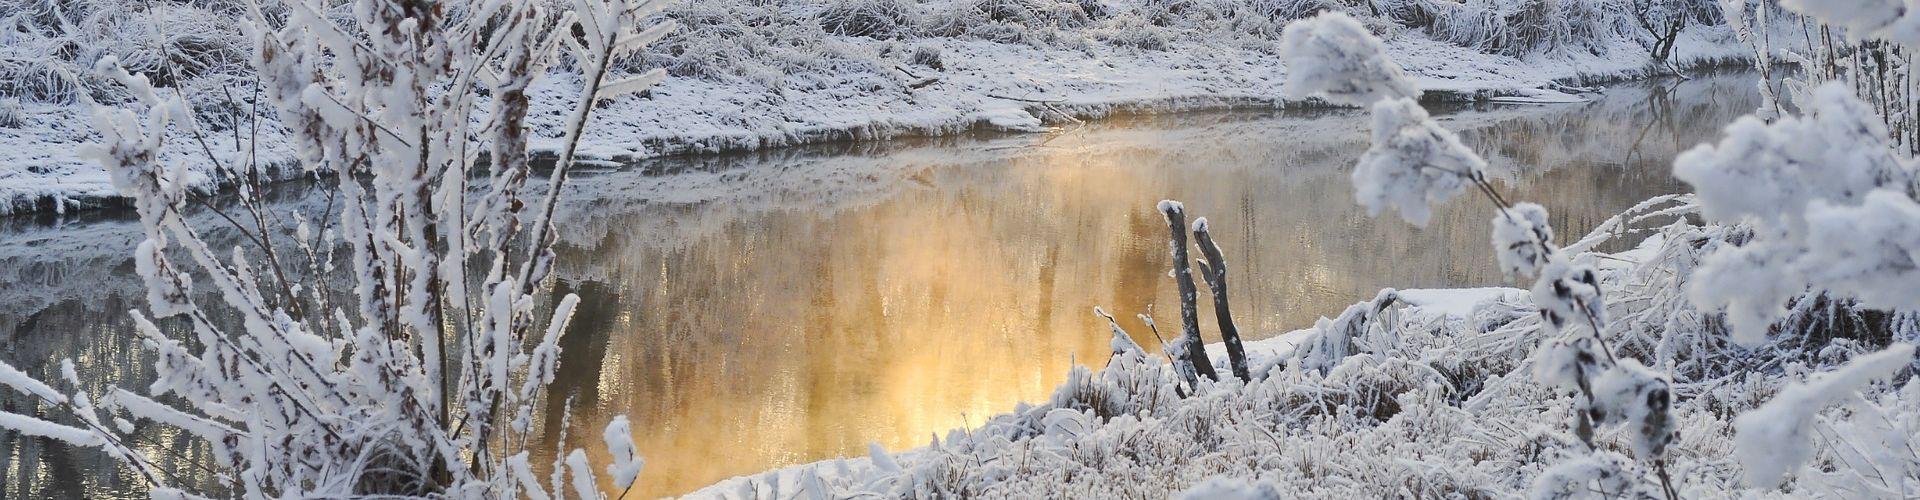 snow-21979_1920crop